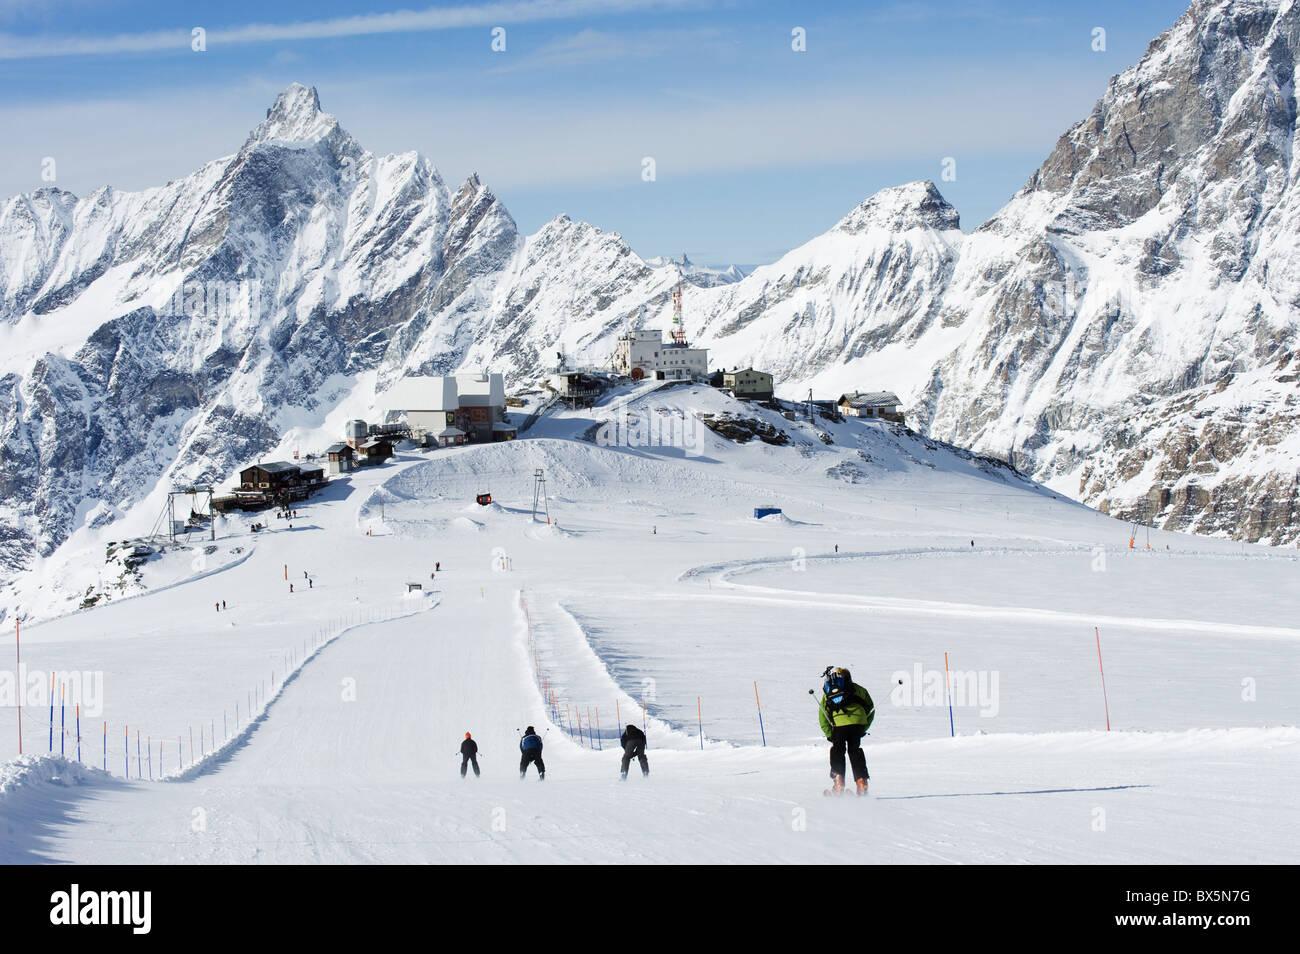 Skiers skiing on a ski run, mountain scenery in Cervinia ski resort, Cervinia, Valle d'Aosta, Italian Alps, - Stock Image